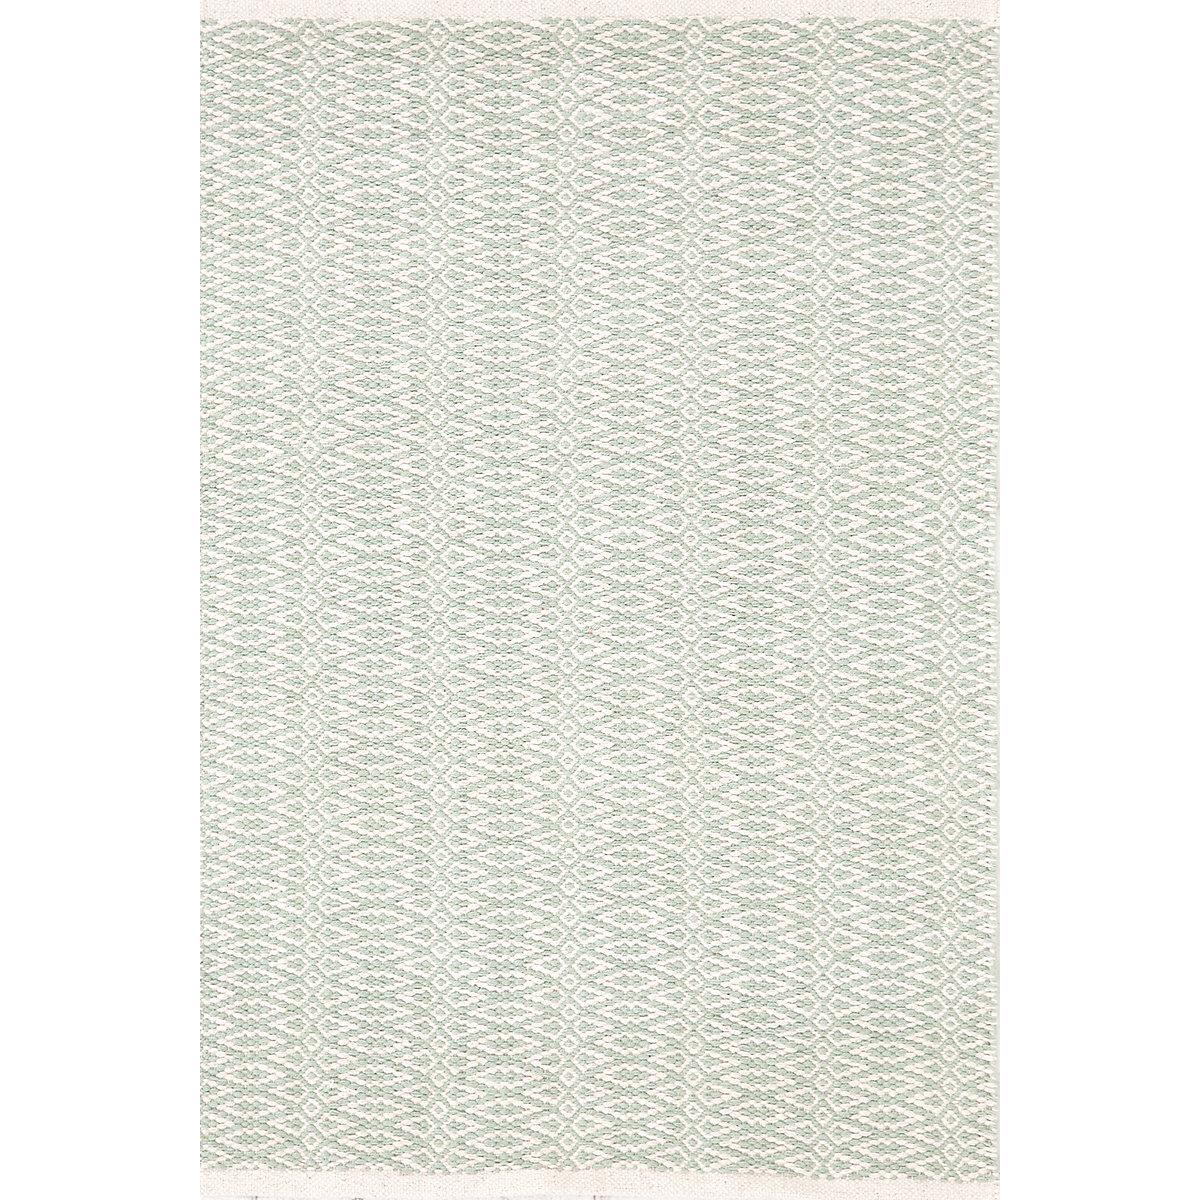 Fair isle ocean ivory cotton woven rug dash albert for Dash and albert blankets